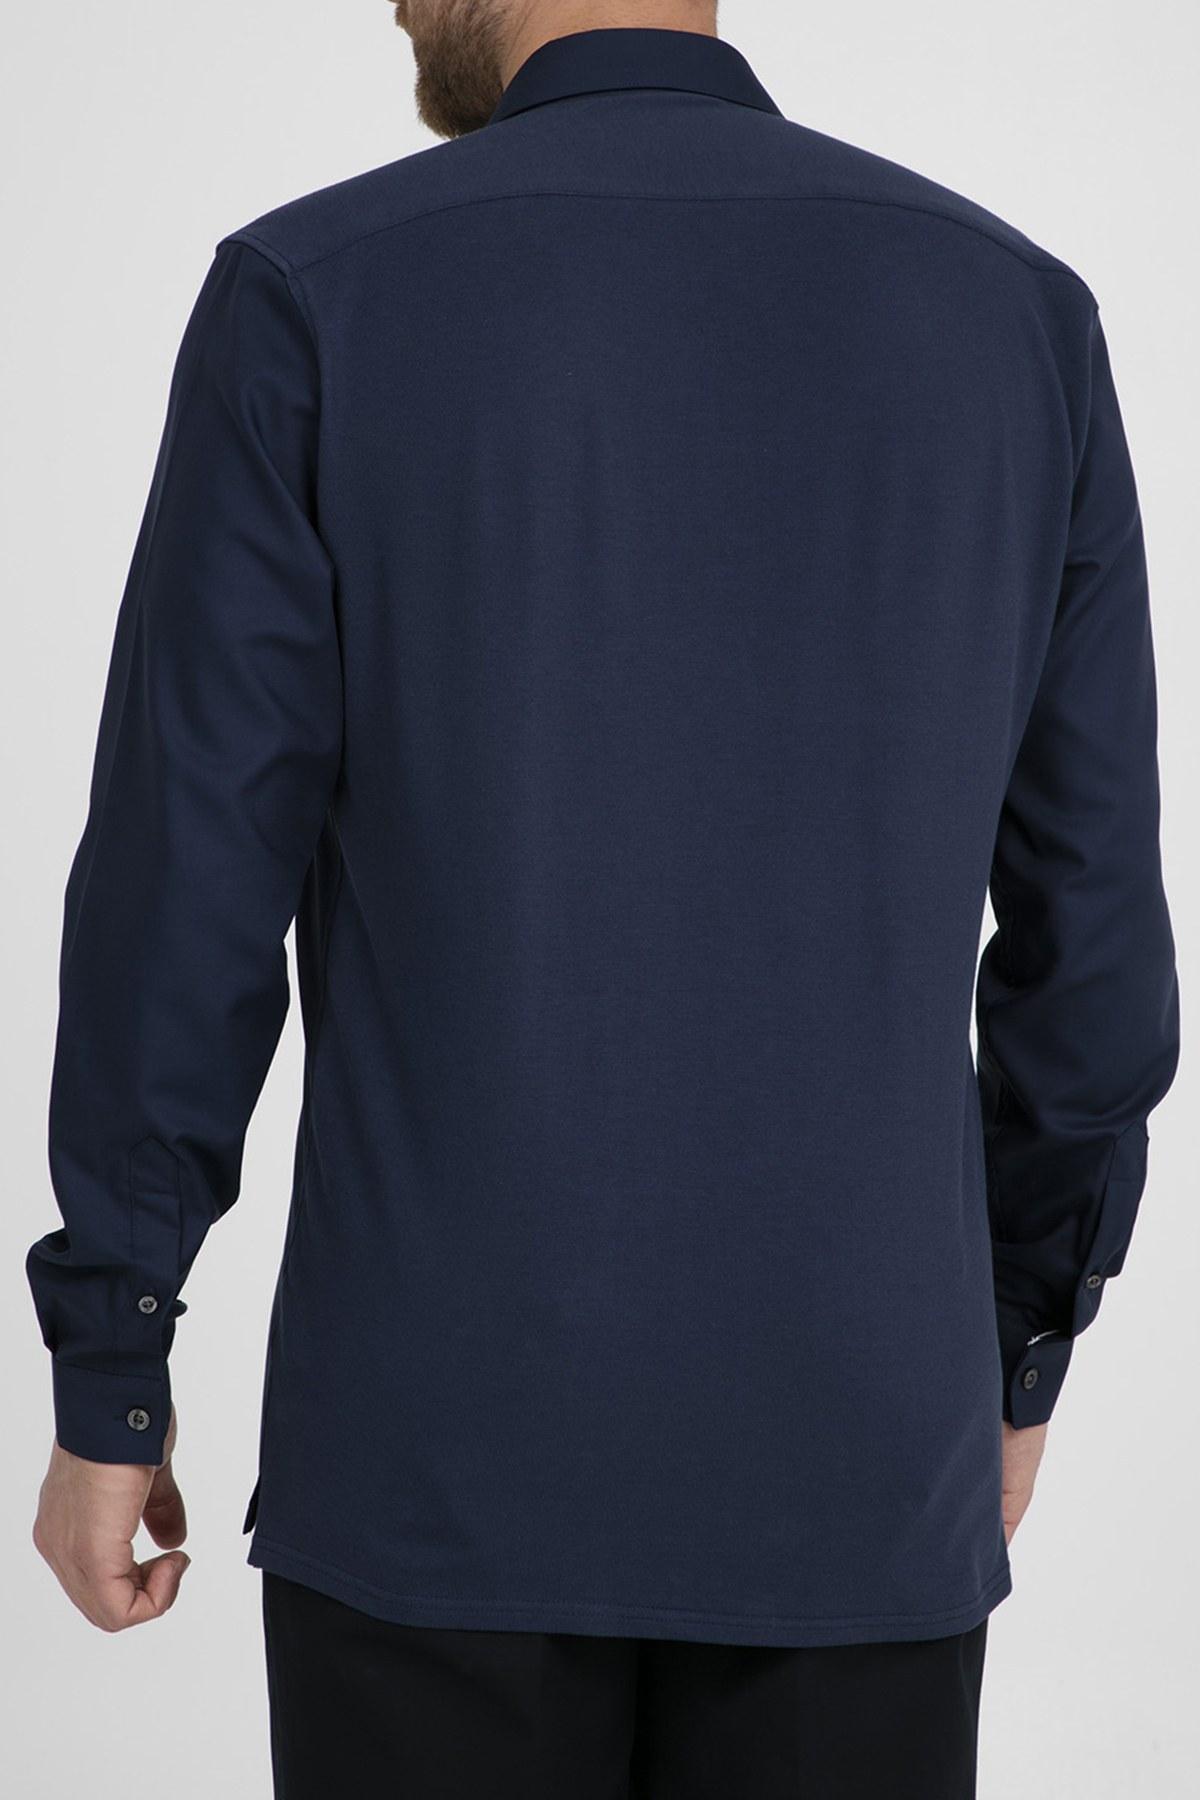 Lacoste Erkek Gömlek CH0704 166 LACİVERT